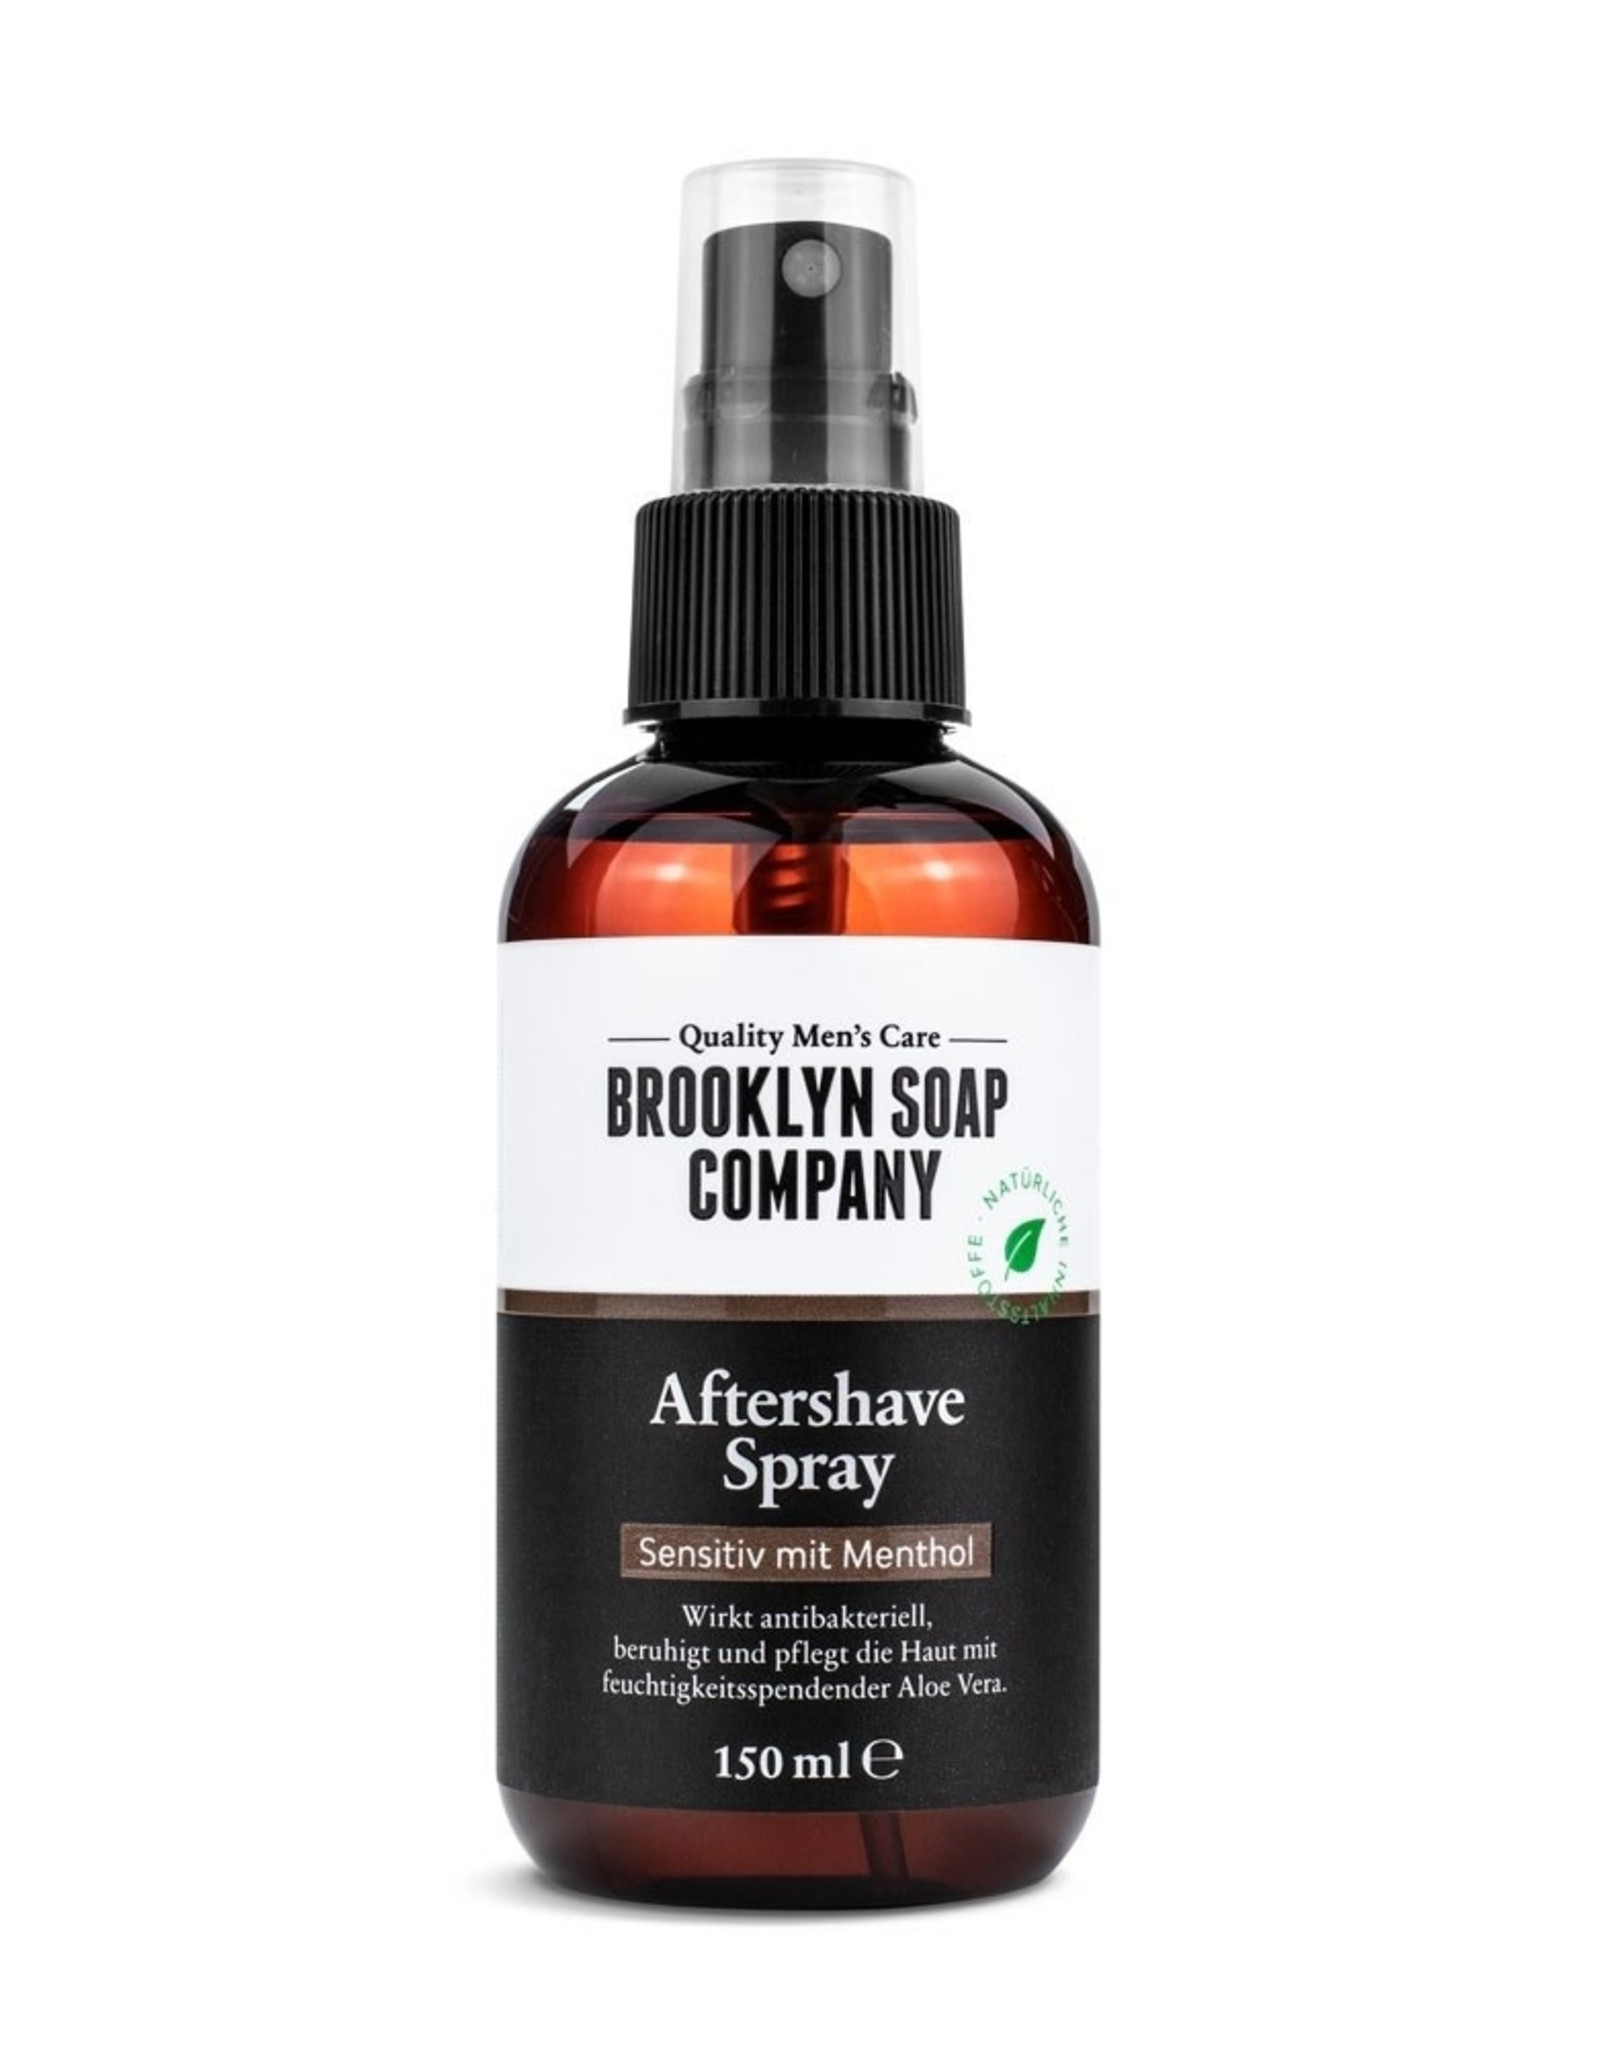 Brooklyn Soap Company Brooklyn Soap Company Aftershave Spray 150ml